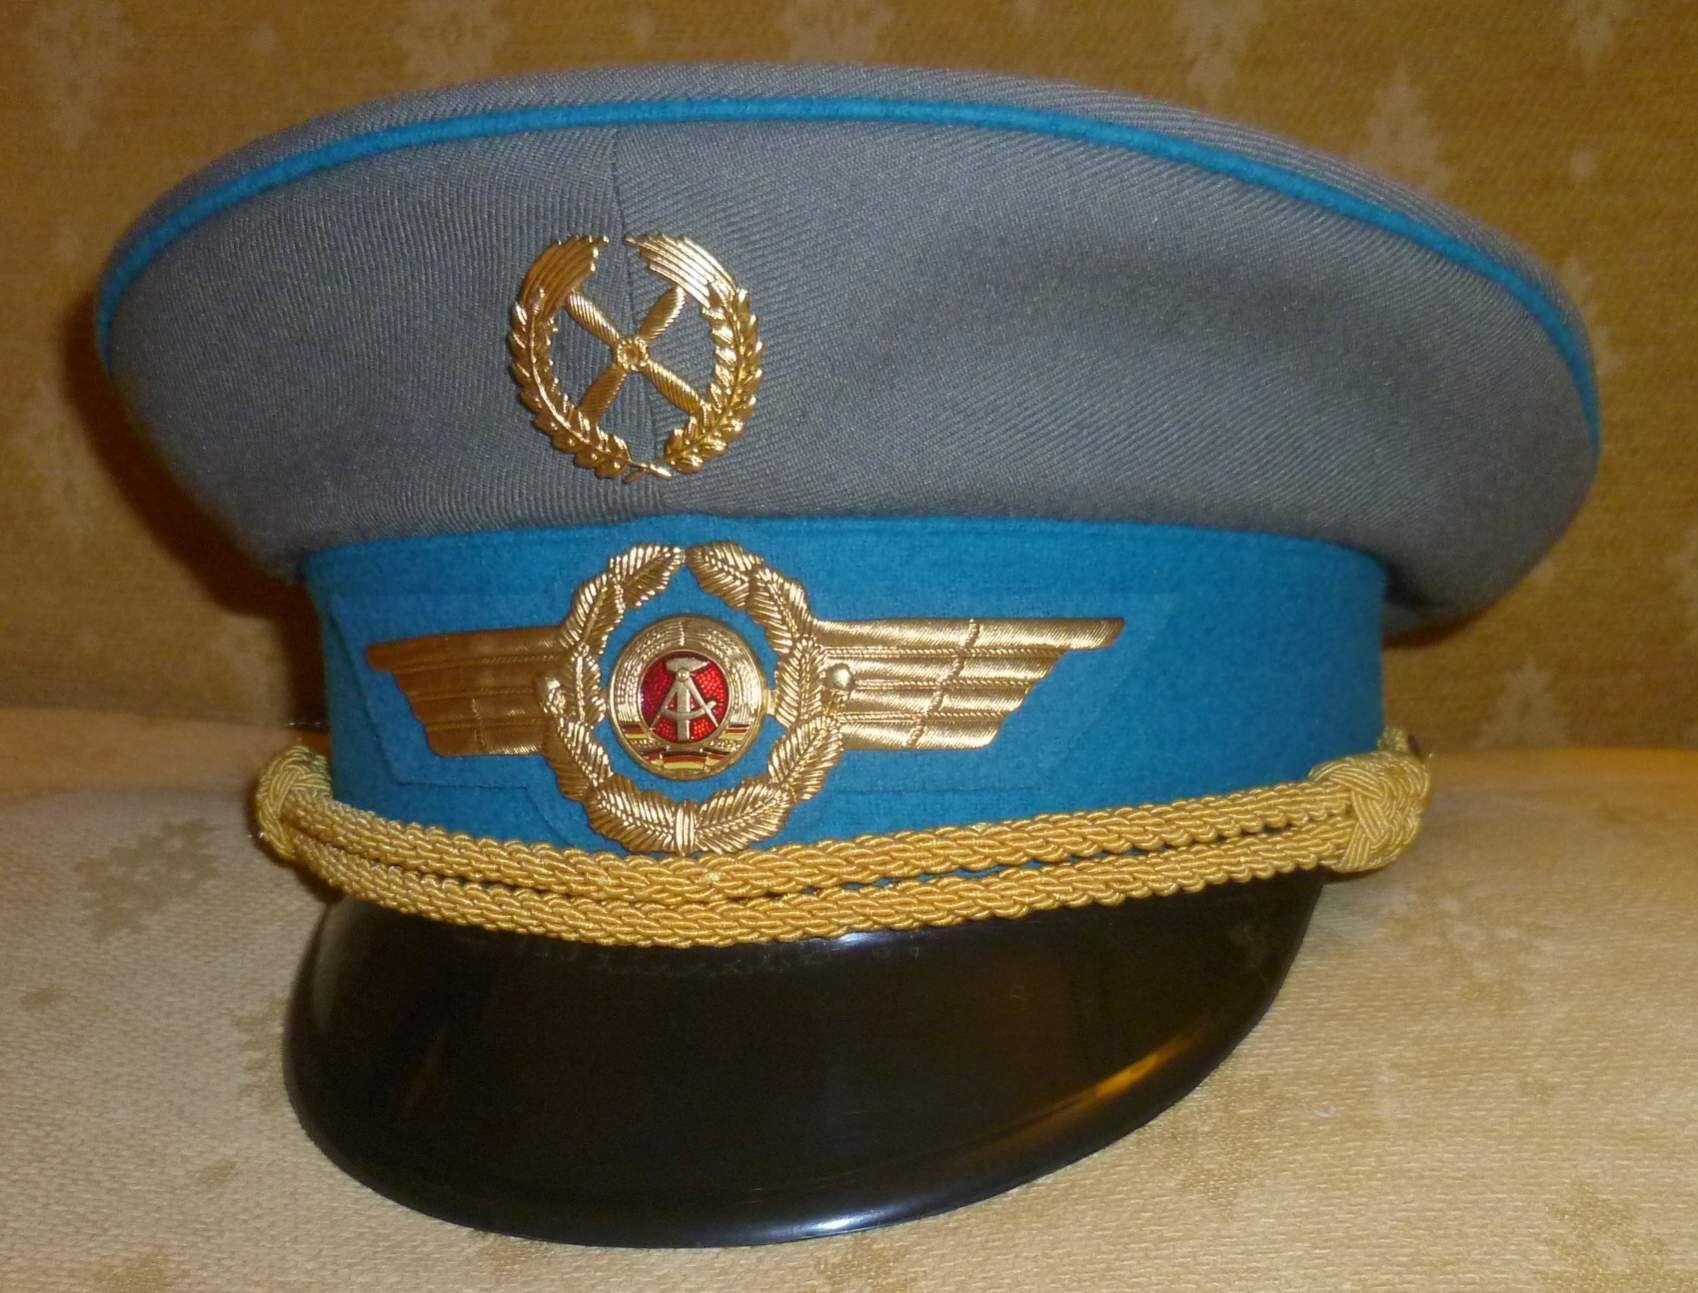 6f68bc07c201e LSK generale schirmmütze   East German Air Force generals  visor cap ...